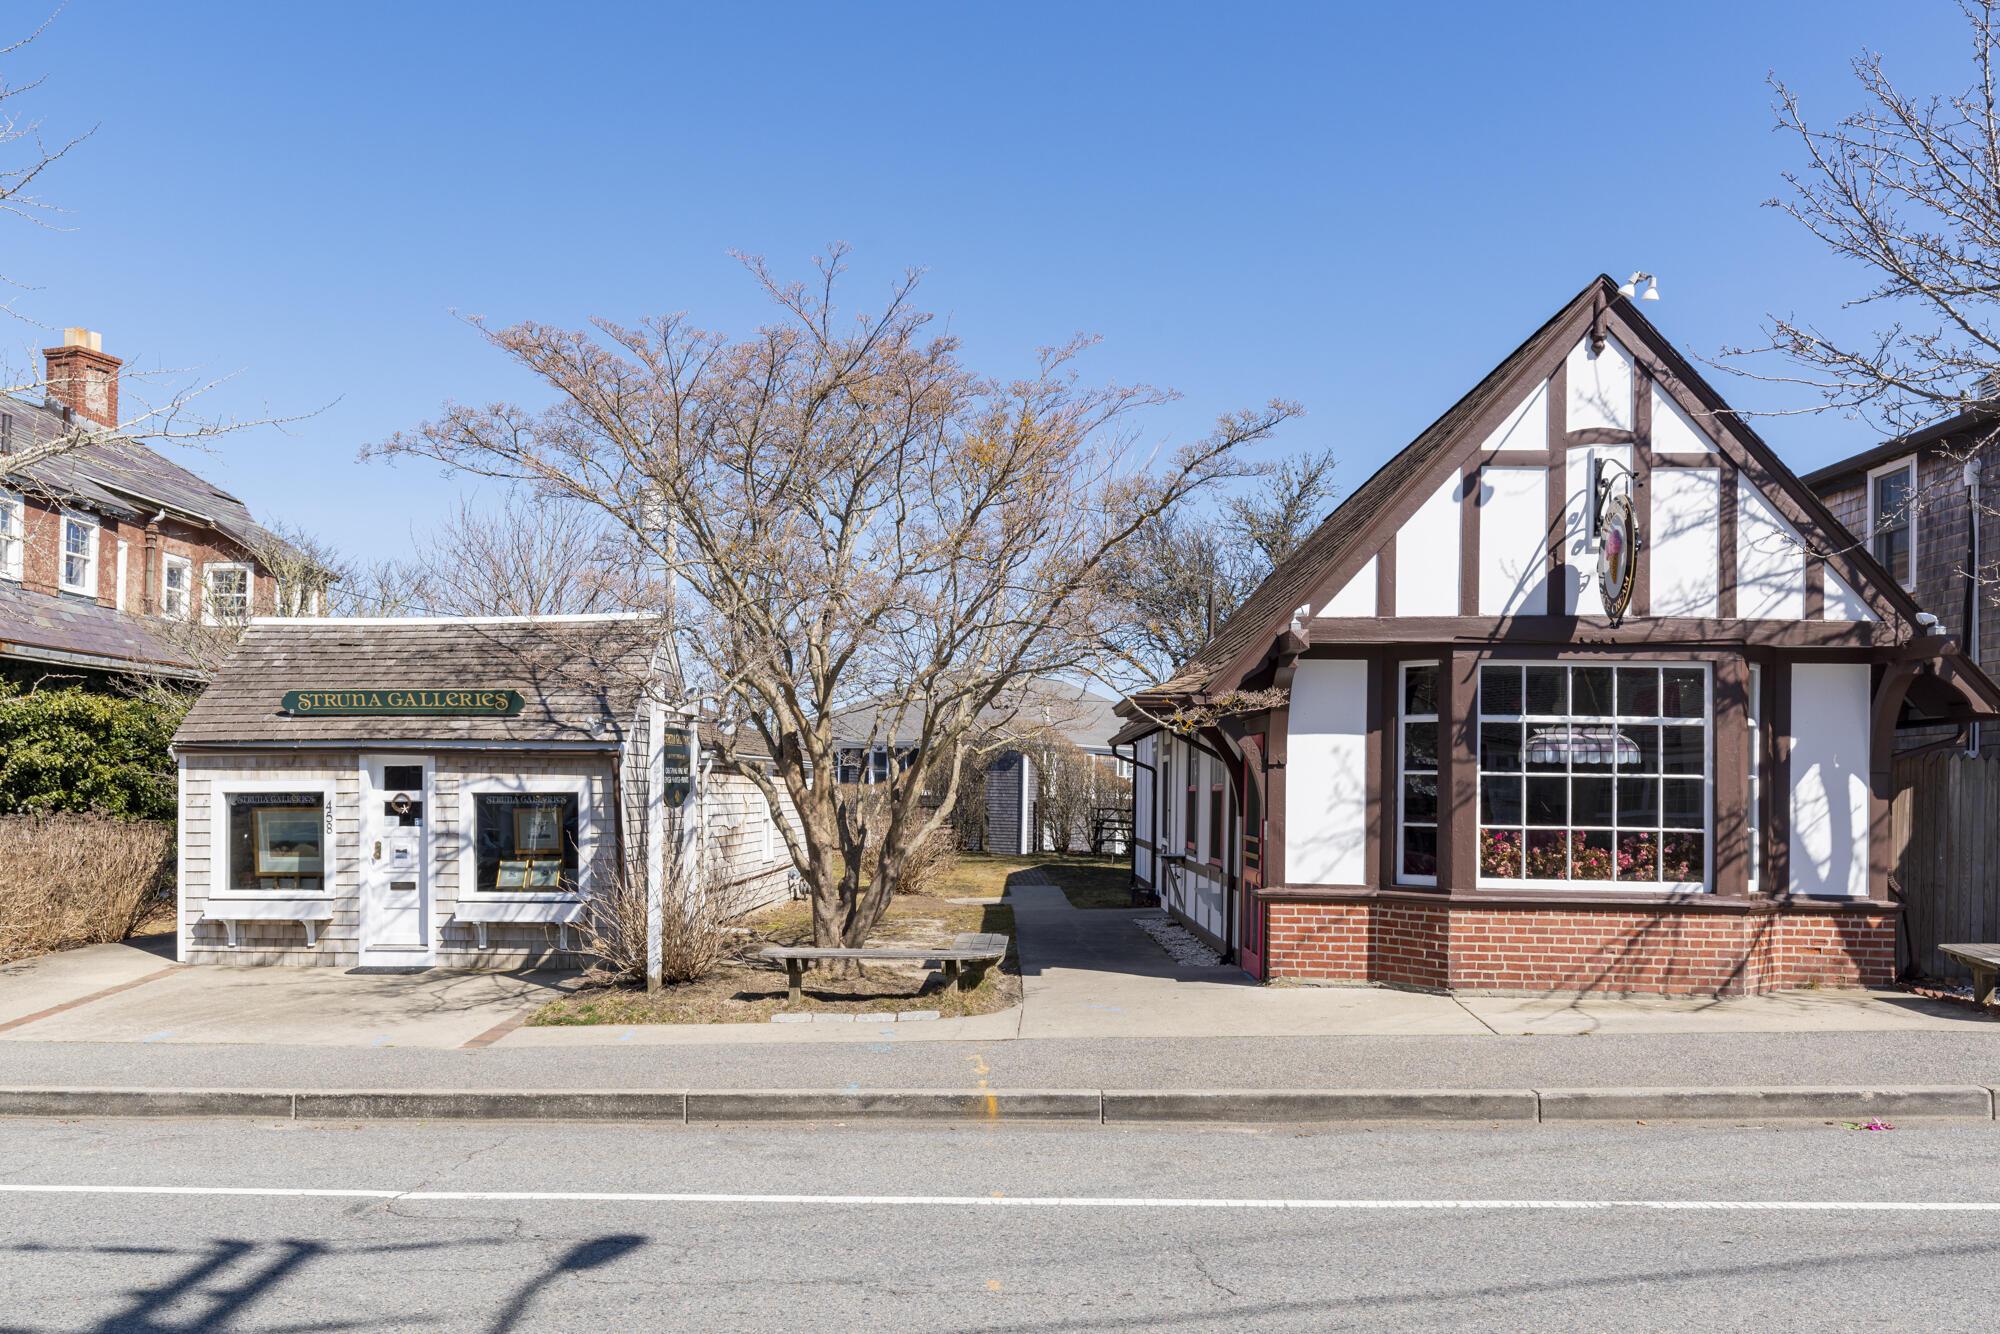 456 Main Street, Chatham, MA  02633 - slide 36